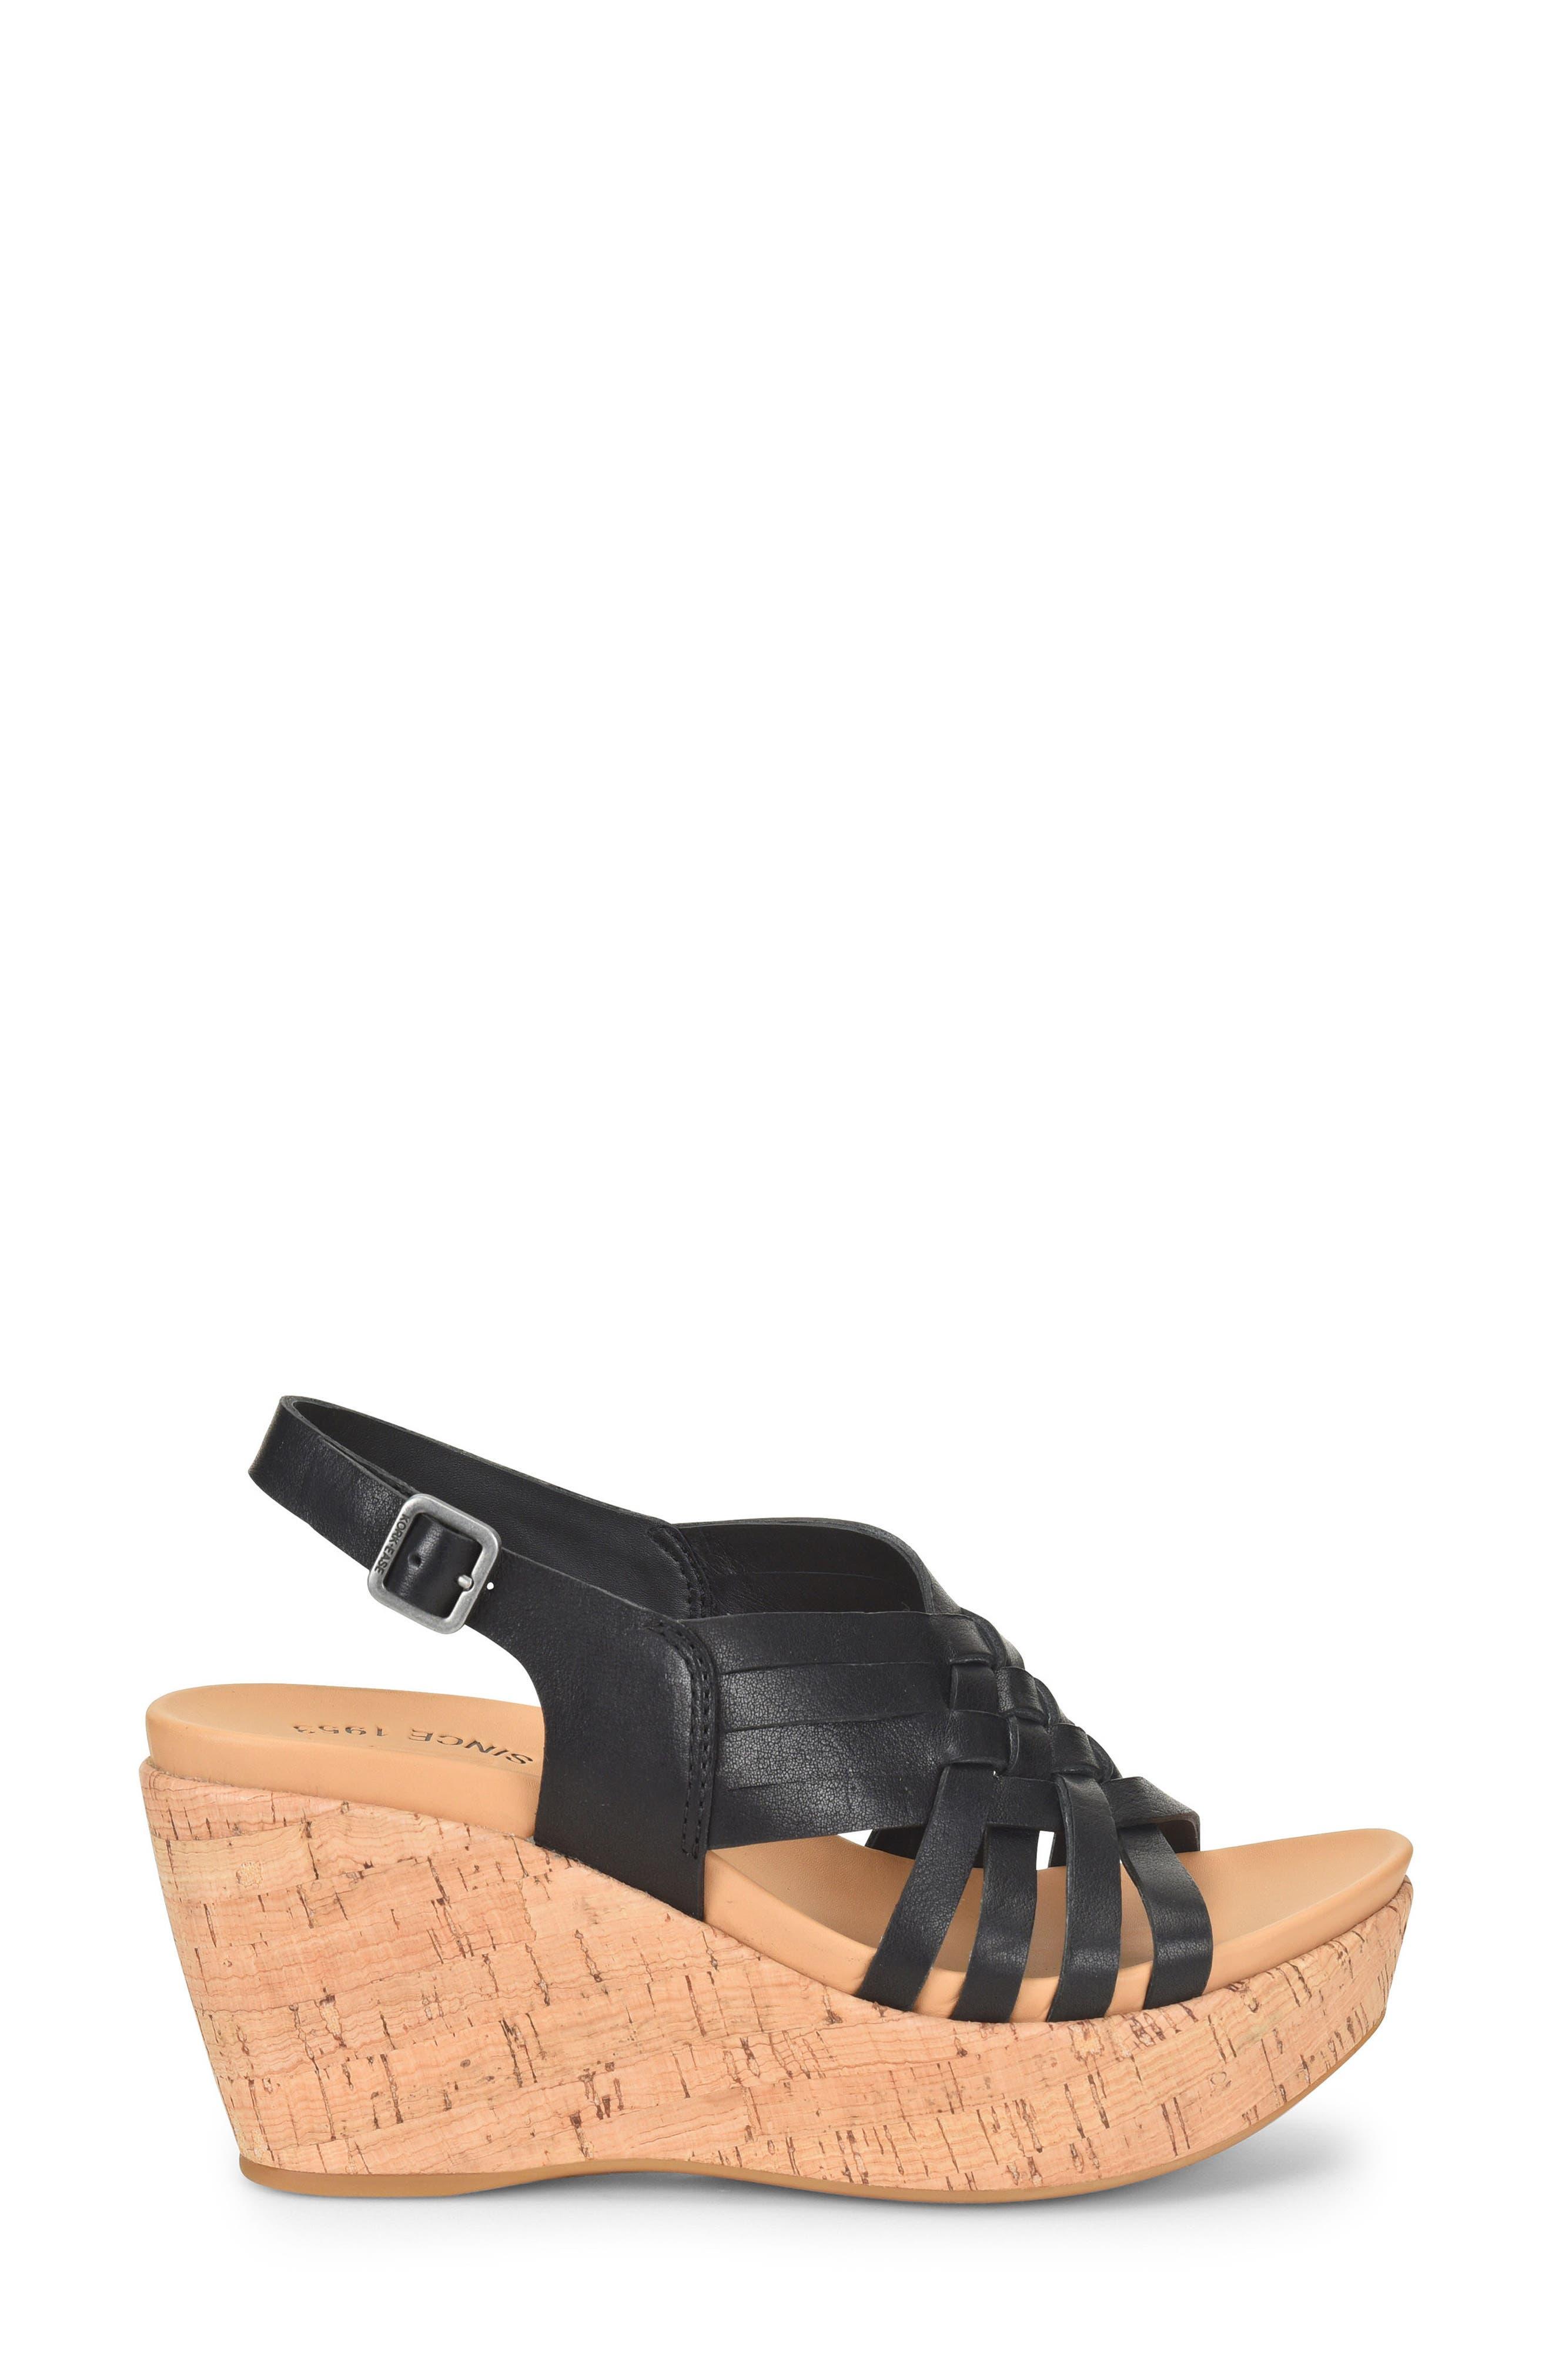 Adelanto Wedge Sandal,                             Alternate thumbnail 3, color,                             BLACK LEATHER